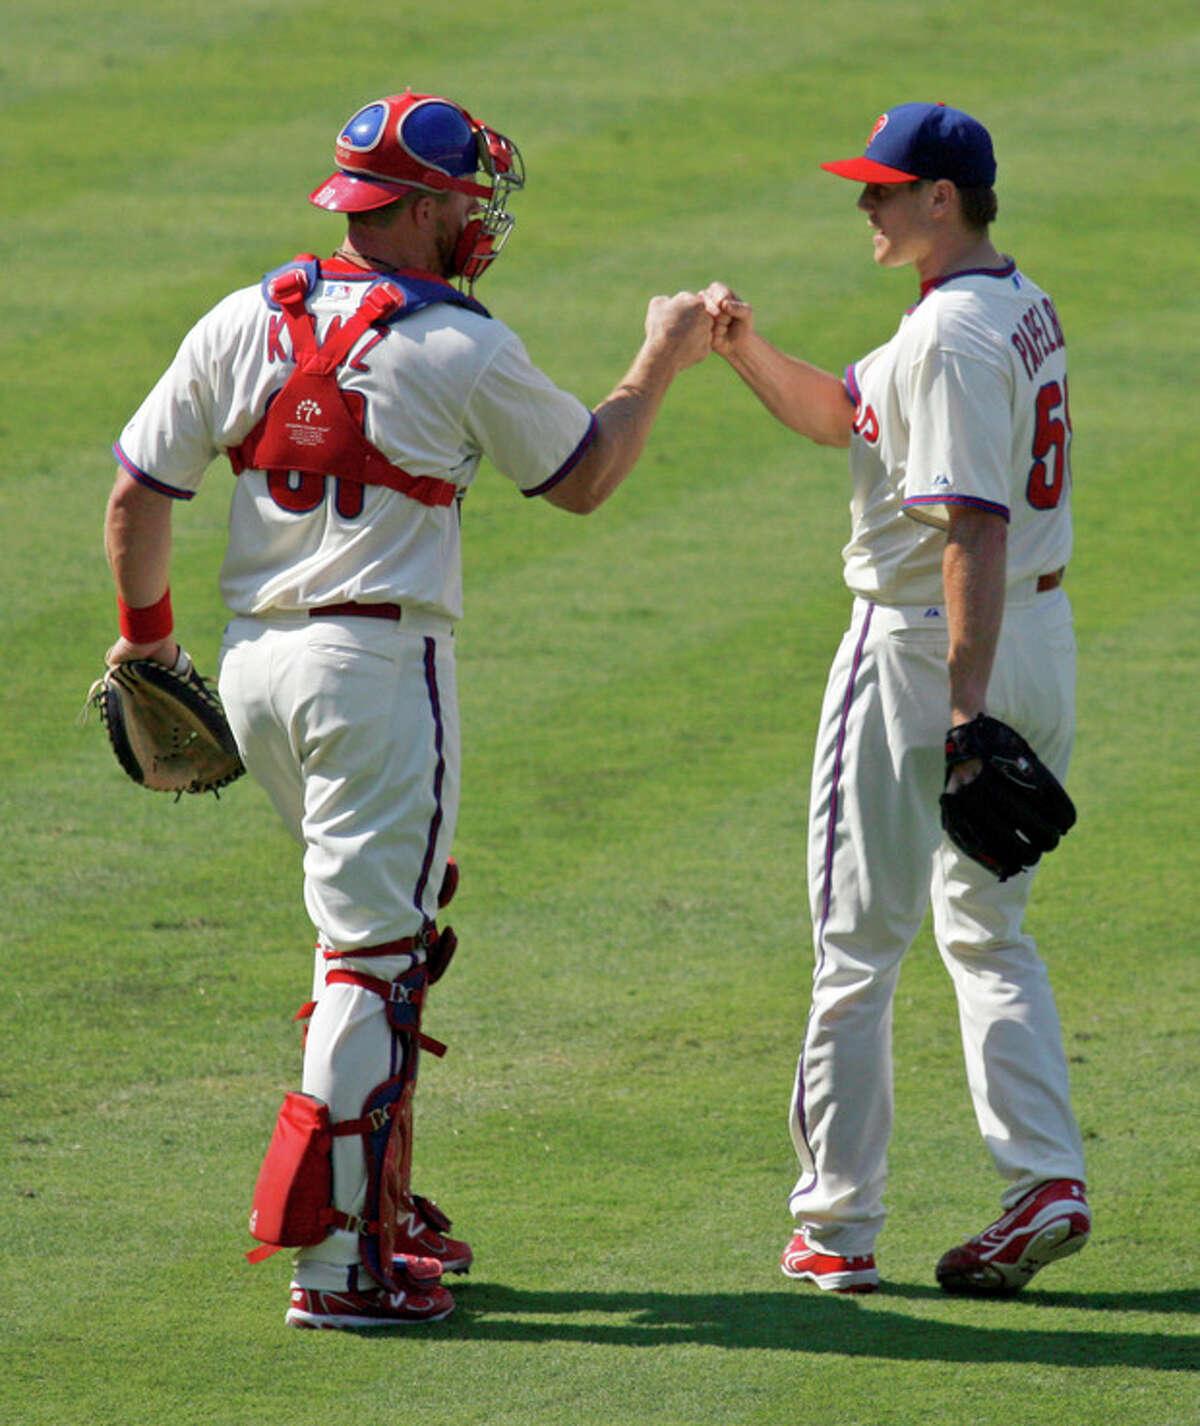 Philadelphia Phillies' Jonathan Papelbon, right celebrates with catcher Erik Kratz after defeating the New York Mets 3-2 in a baseball game Thursday, Aug. 30, 2012, in Philadelphia. (AP Photo/H. Rumph Jr)